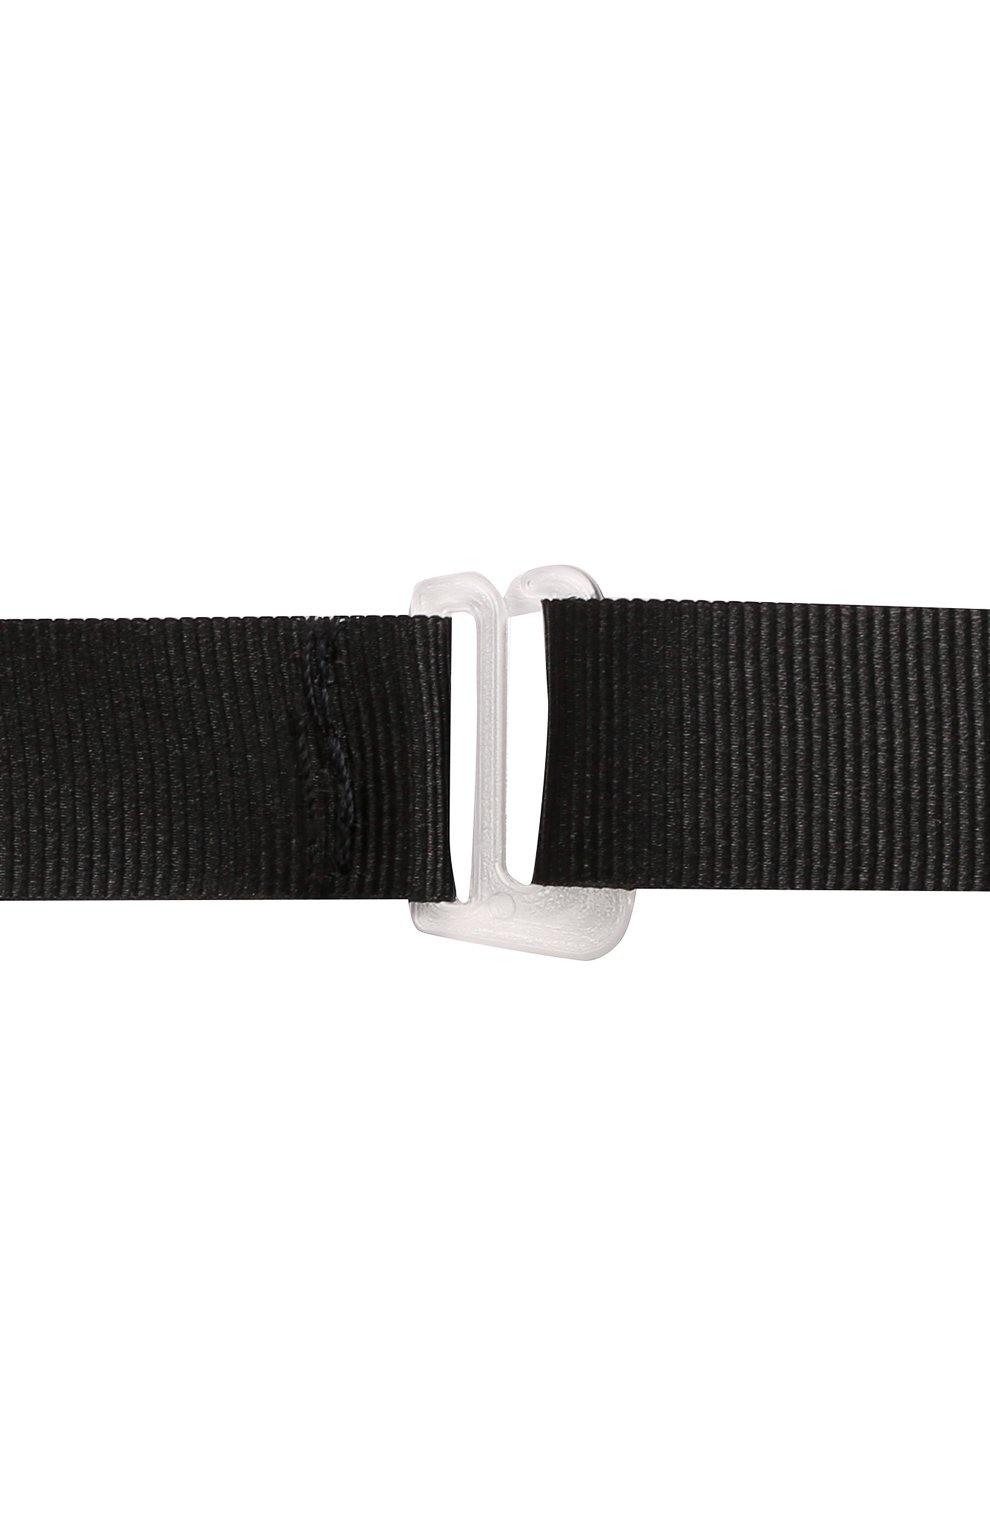 Детский галстук-бабочка PAOLO PECORA MILANO черного цвета, арт. PP2619   Фото 3 (Материал: Текстиль, Вискоза, Синтетический материал)